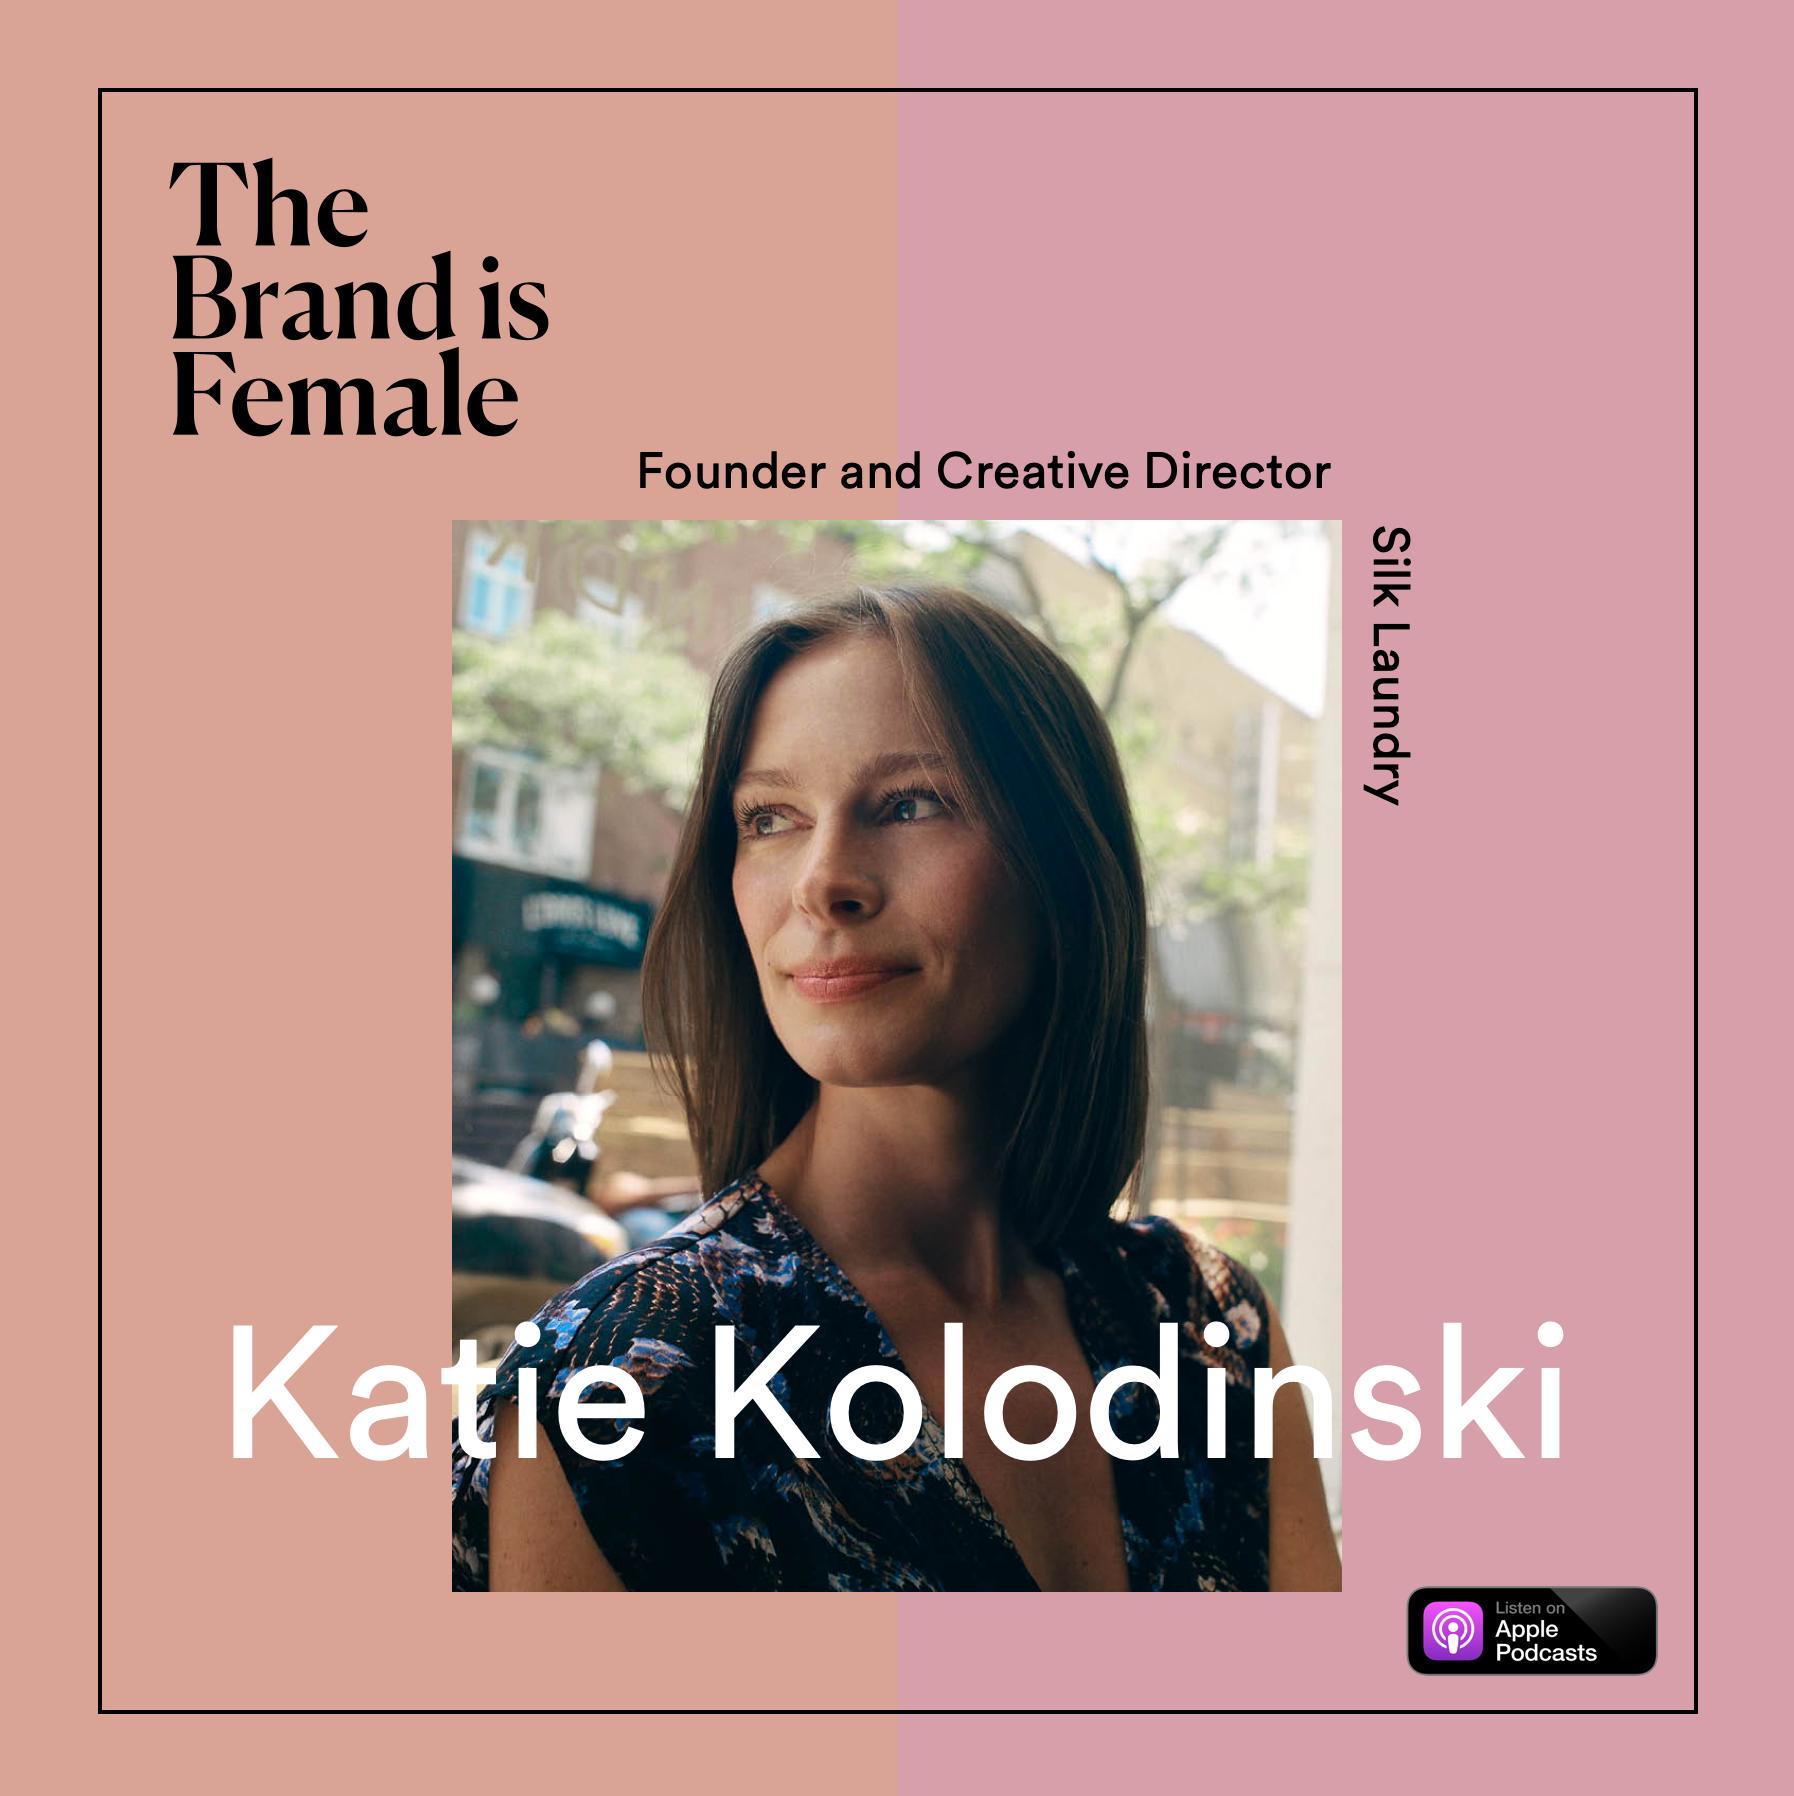 Katie Kolodinski